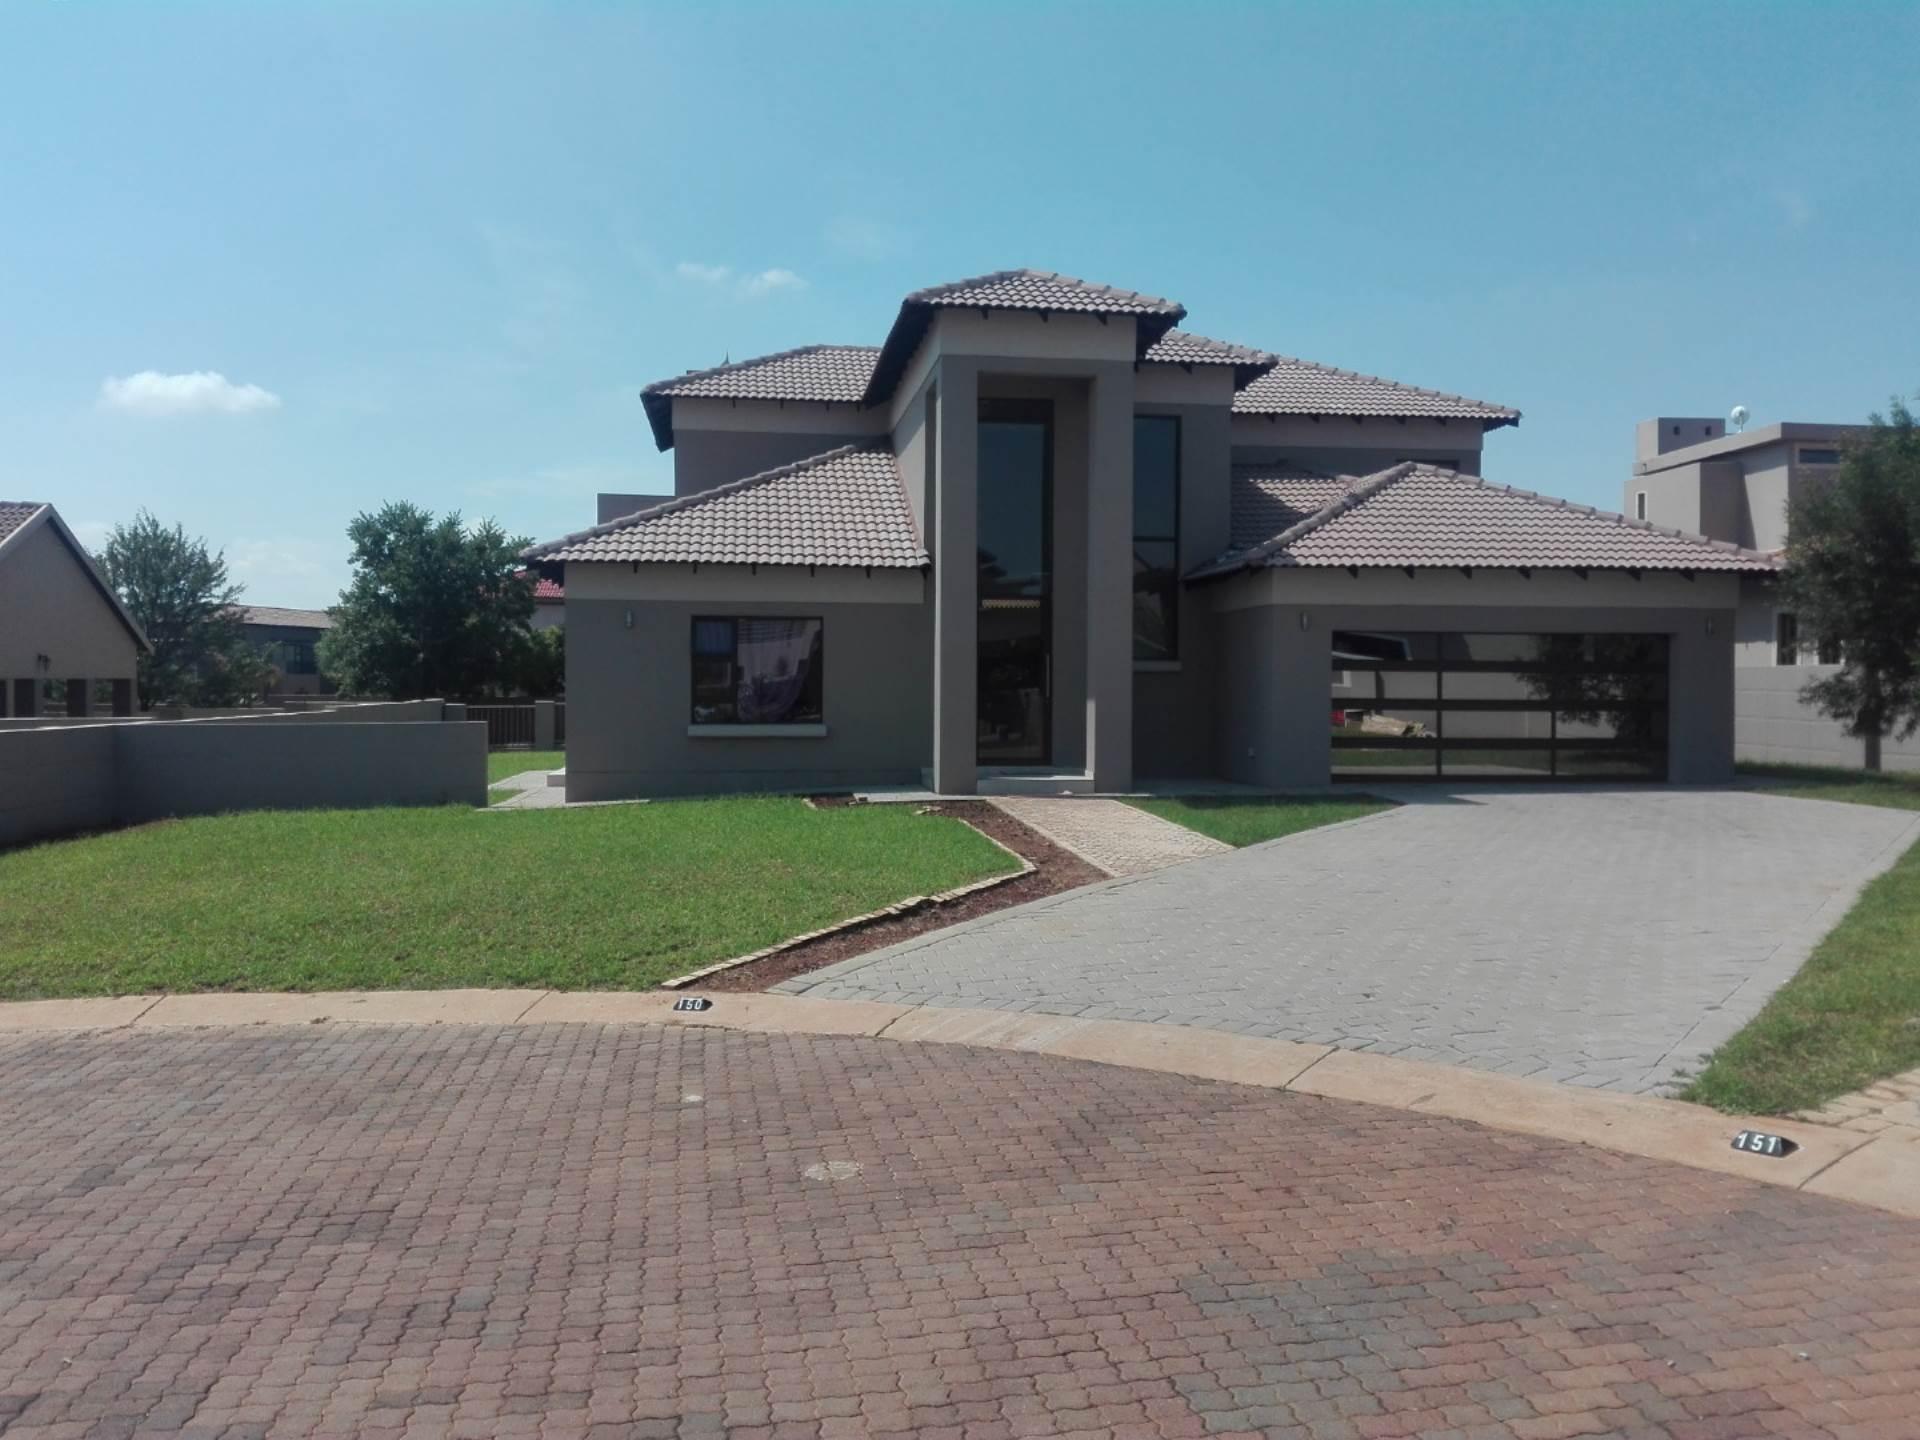 4 BedroomHouse Pending Sale In Monavoni